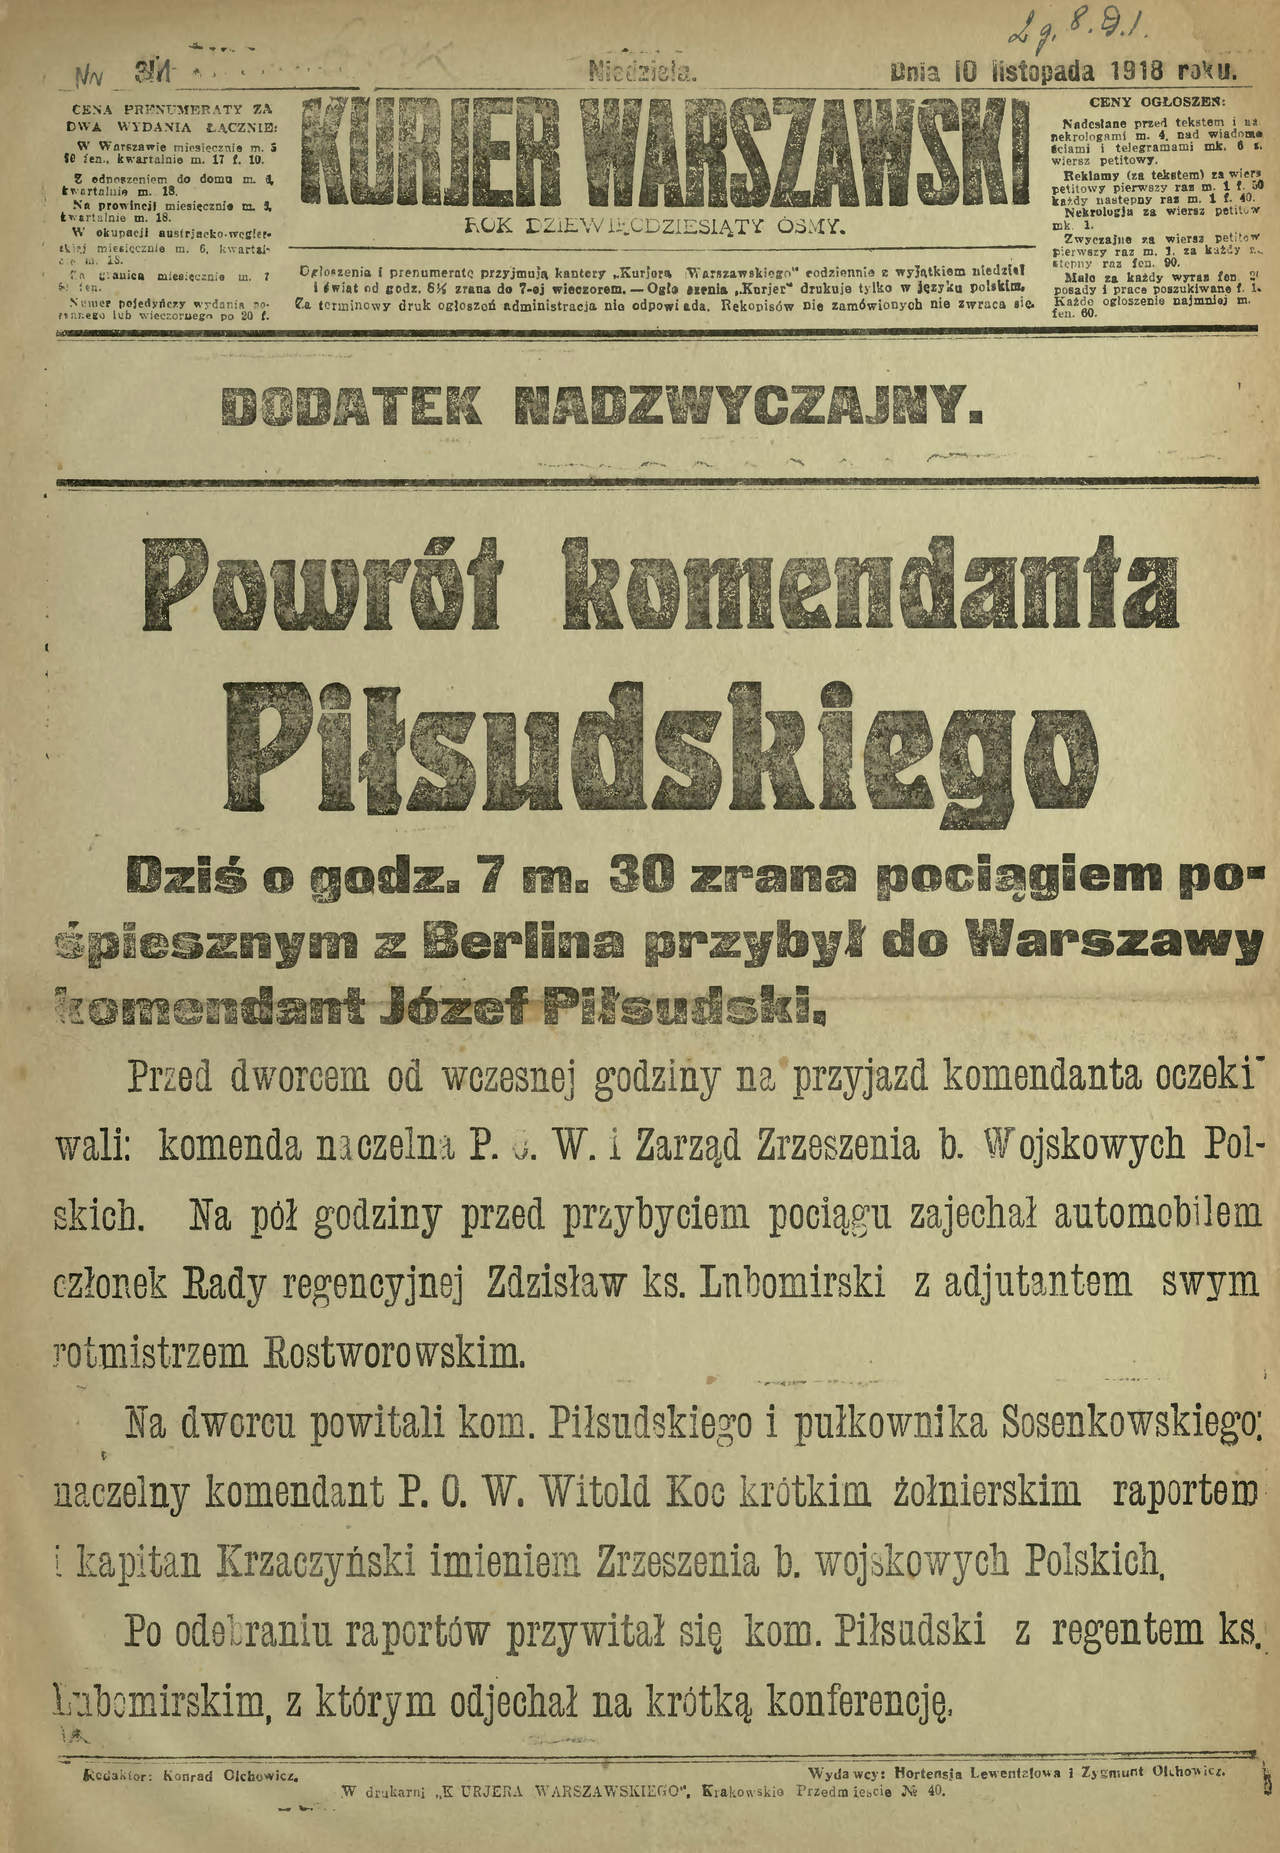 Mariusz Nowik On Twitter 100lattemu Józef Piłsudski O